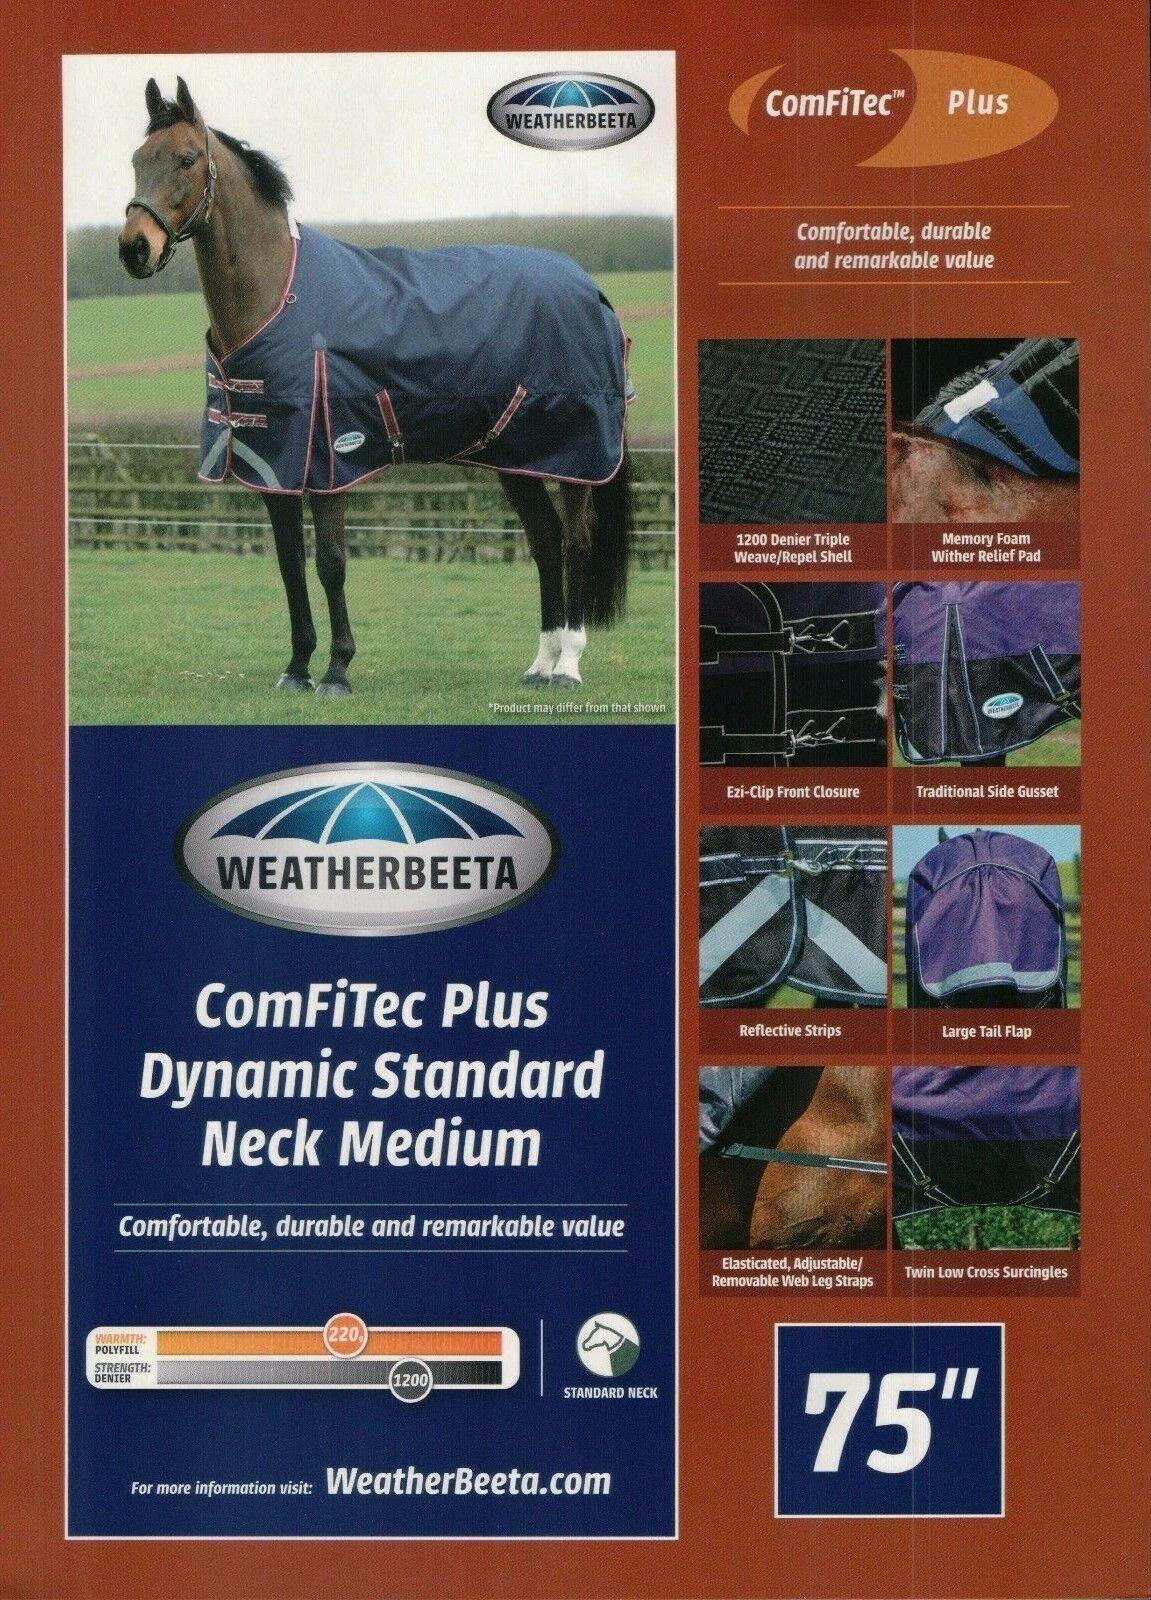 WeatherBeeta ComFiTec Plus Dynamic Steard Neck Medium Weight 81 Blanket